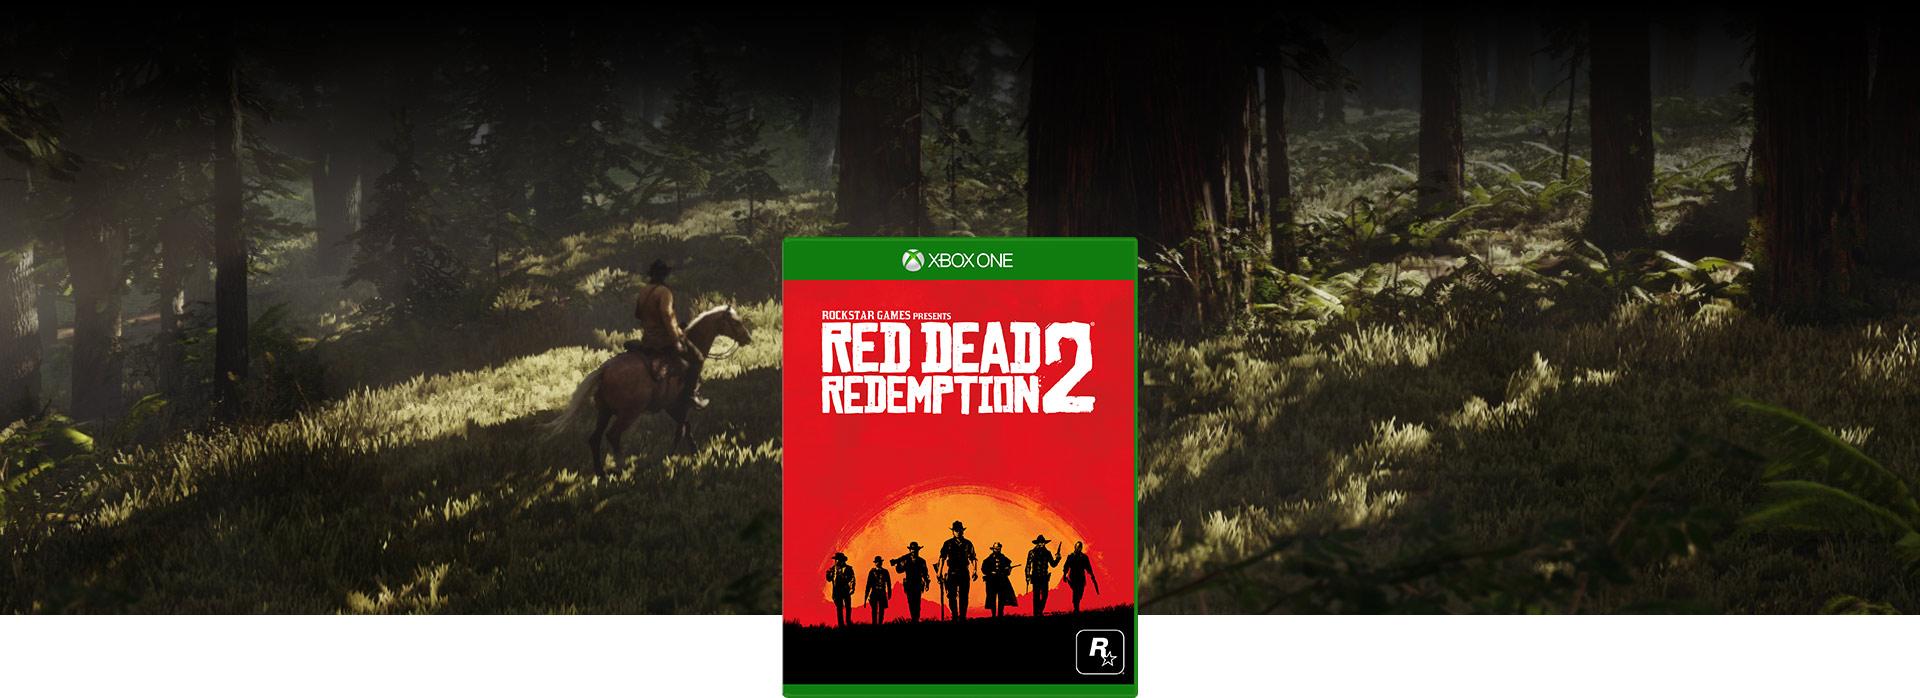 Red Dead Redemption 2 kutu resmi